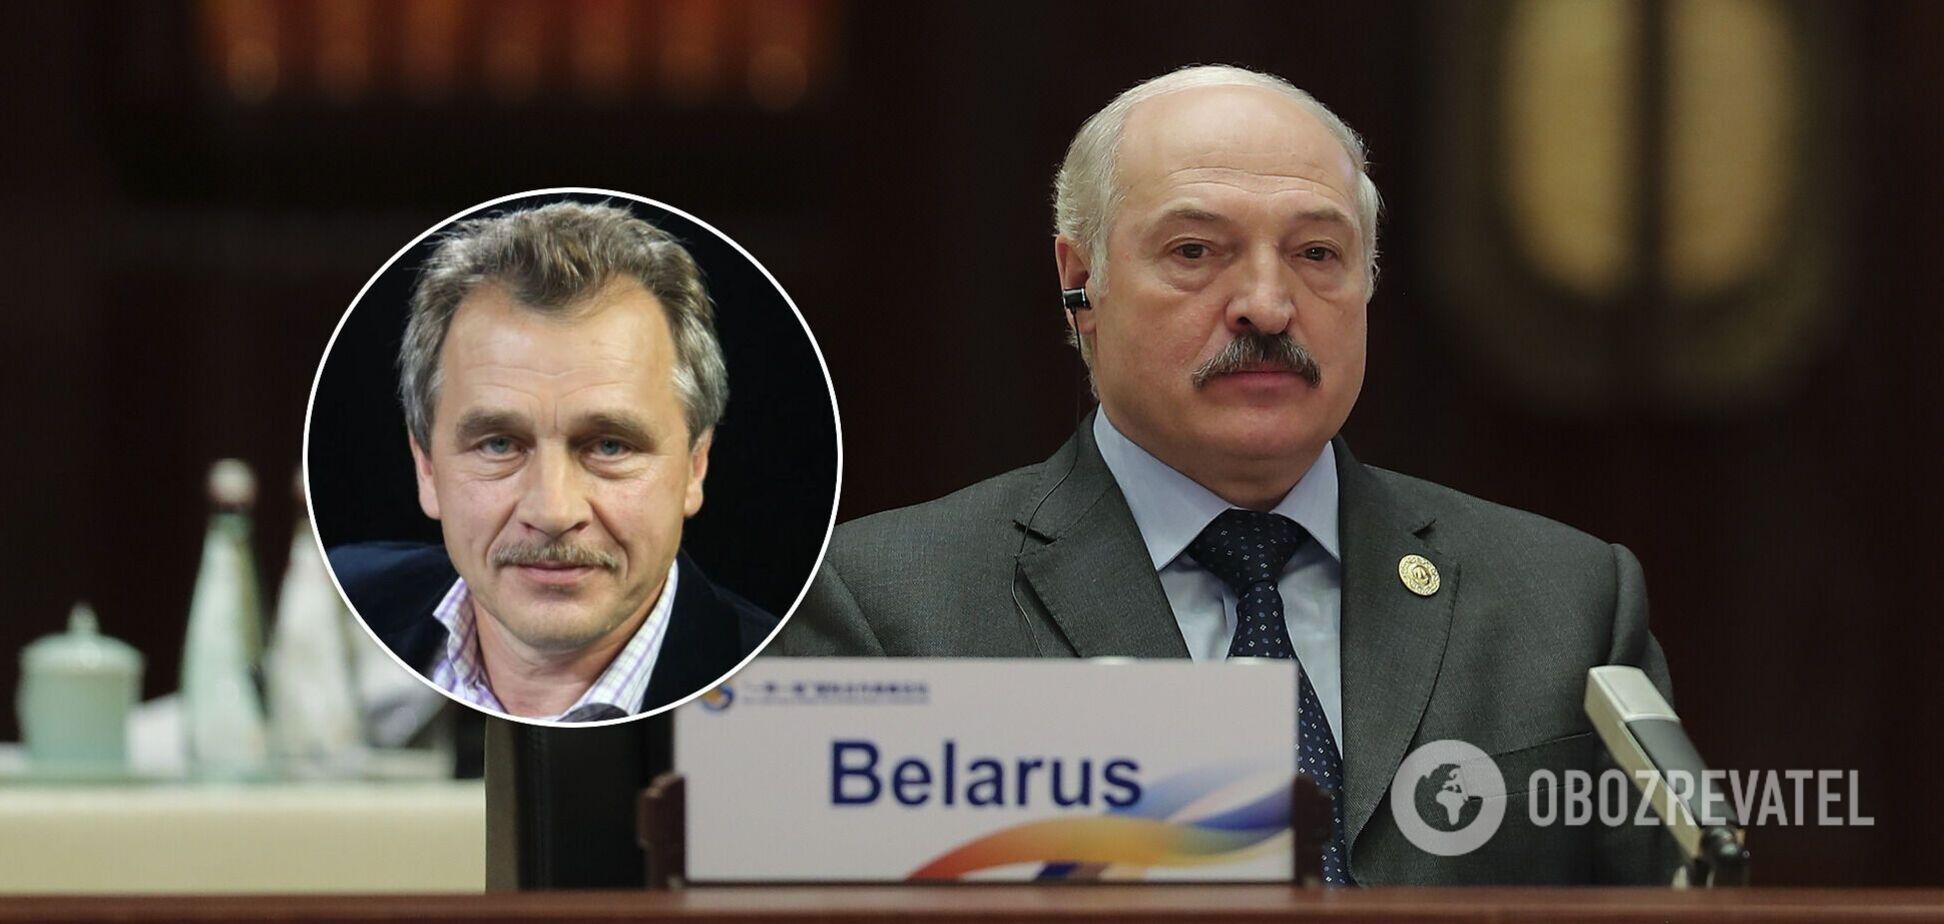 Гаага все ближе к Лукашенко, – оппозиционер